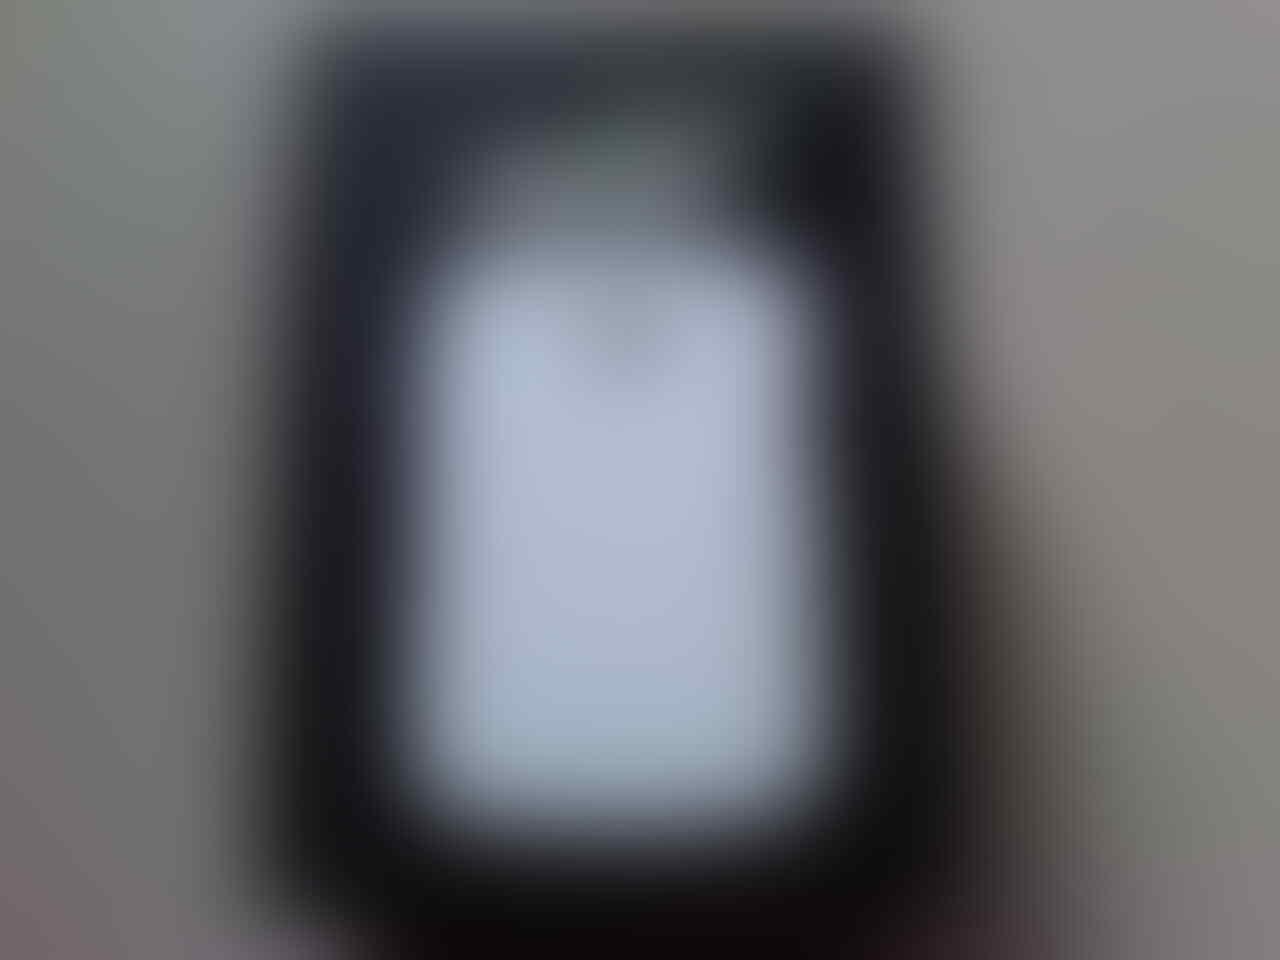 DIJUAL BLACKBERRY CURVE 9360 WHITE (Masih garansi TAM)